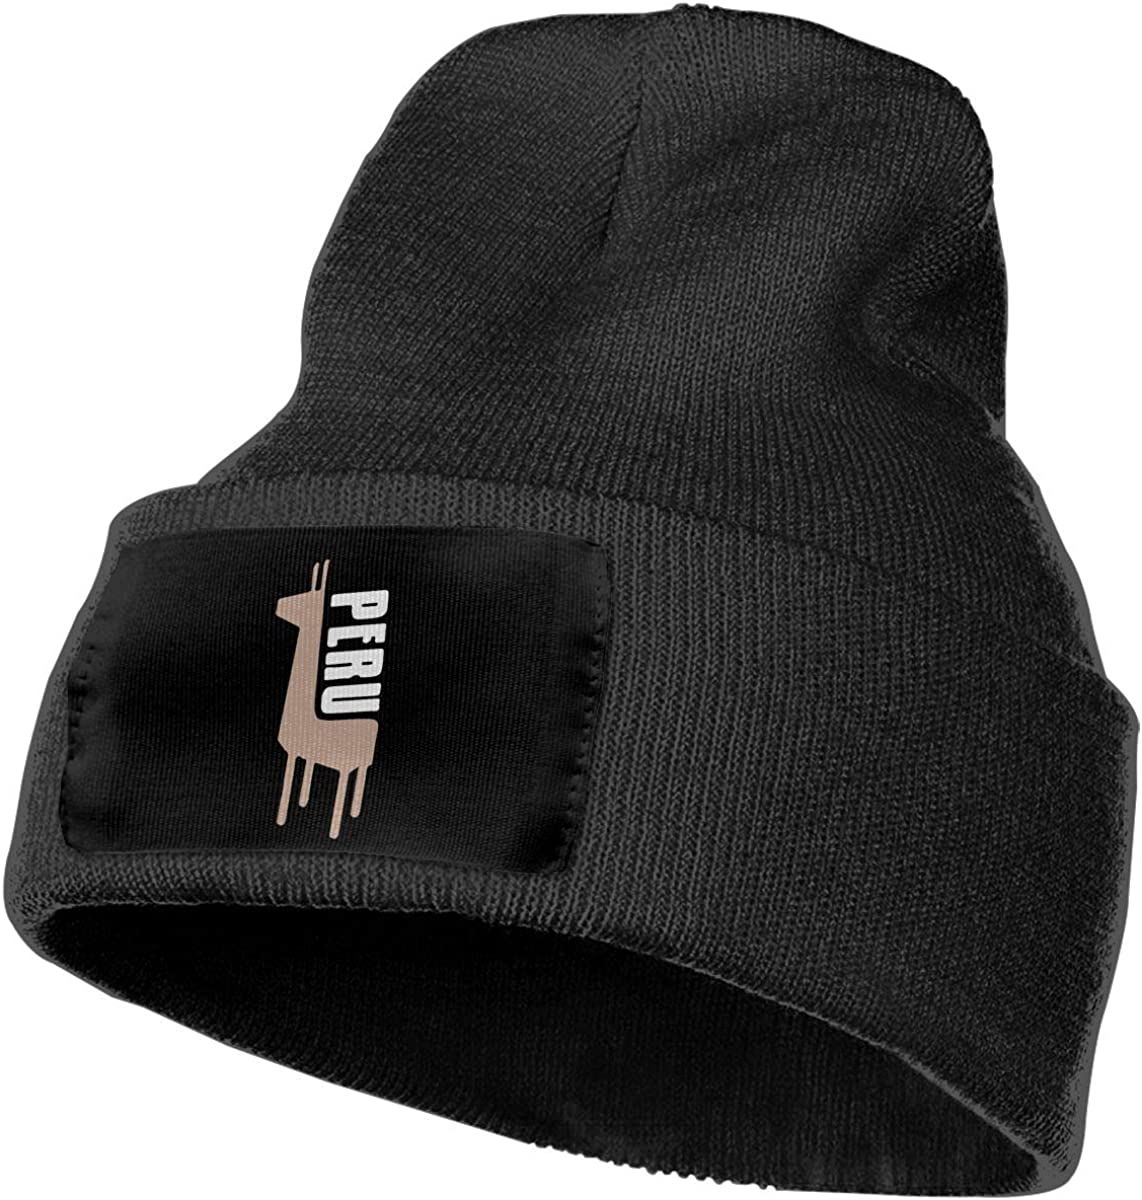 COLLJL-8 Unisex Retro Peruvian Peru Llama Outdoor Fashion Knit Beanies Hat Soft Winter Knit Caps